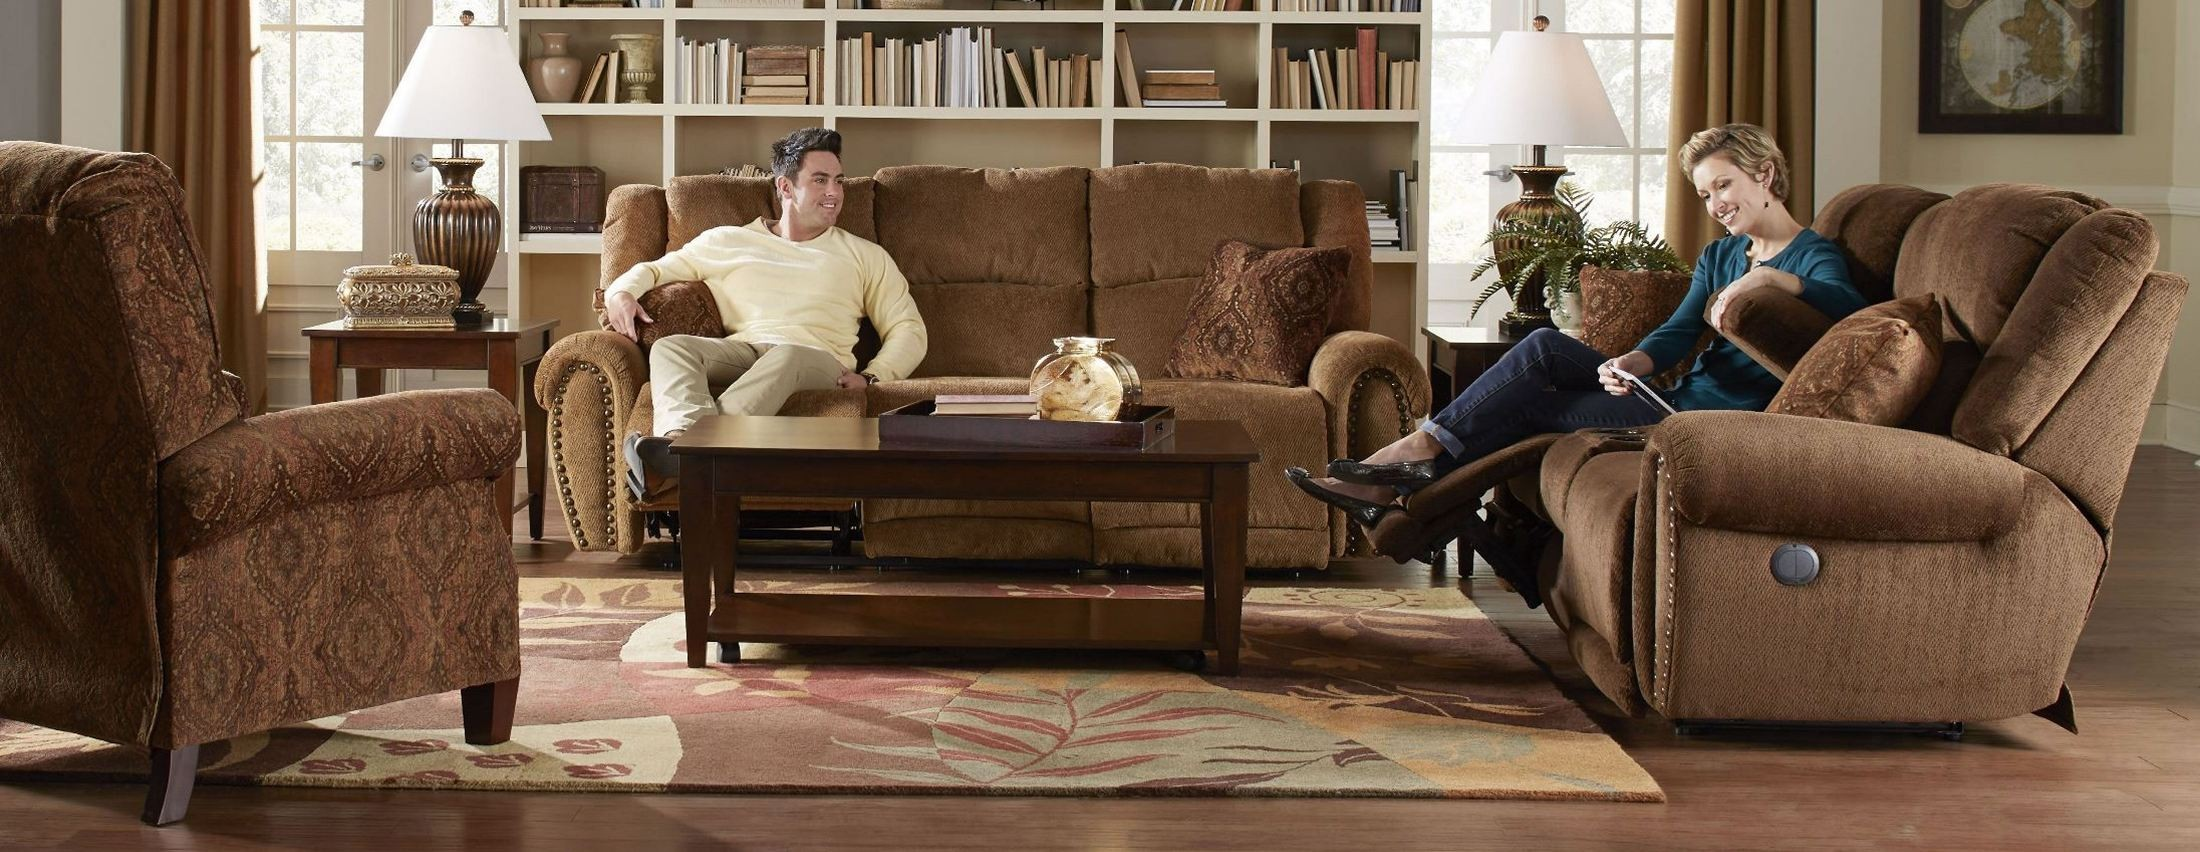 stafford tobacco reclining living room set from catnapper